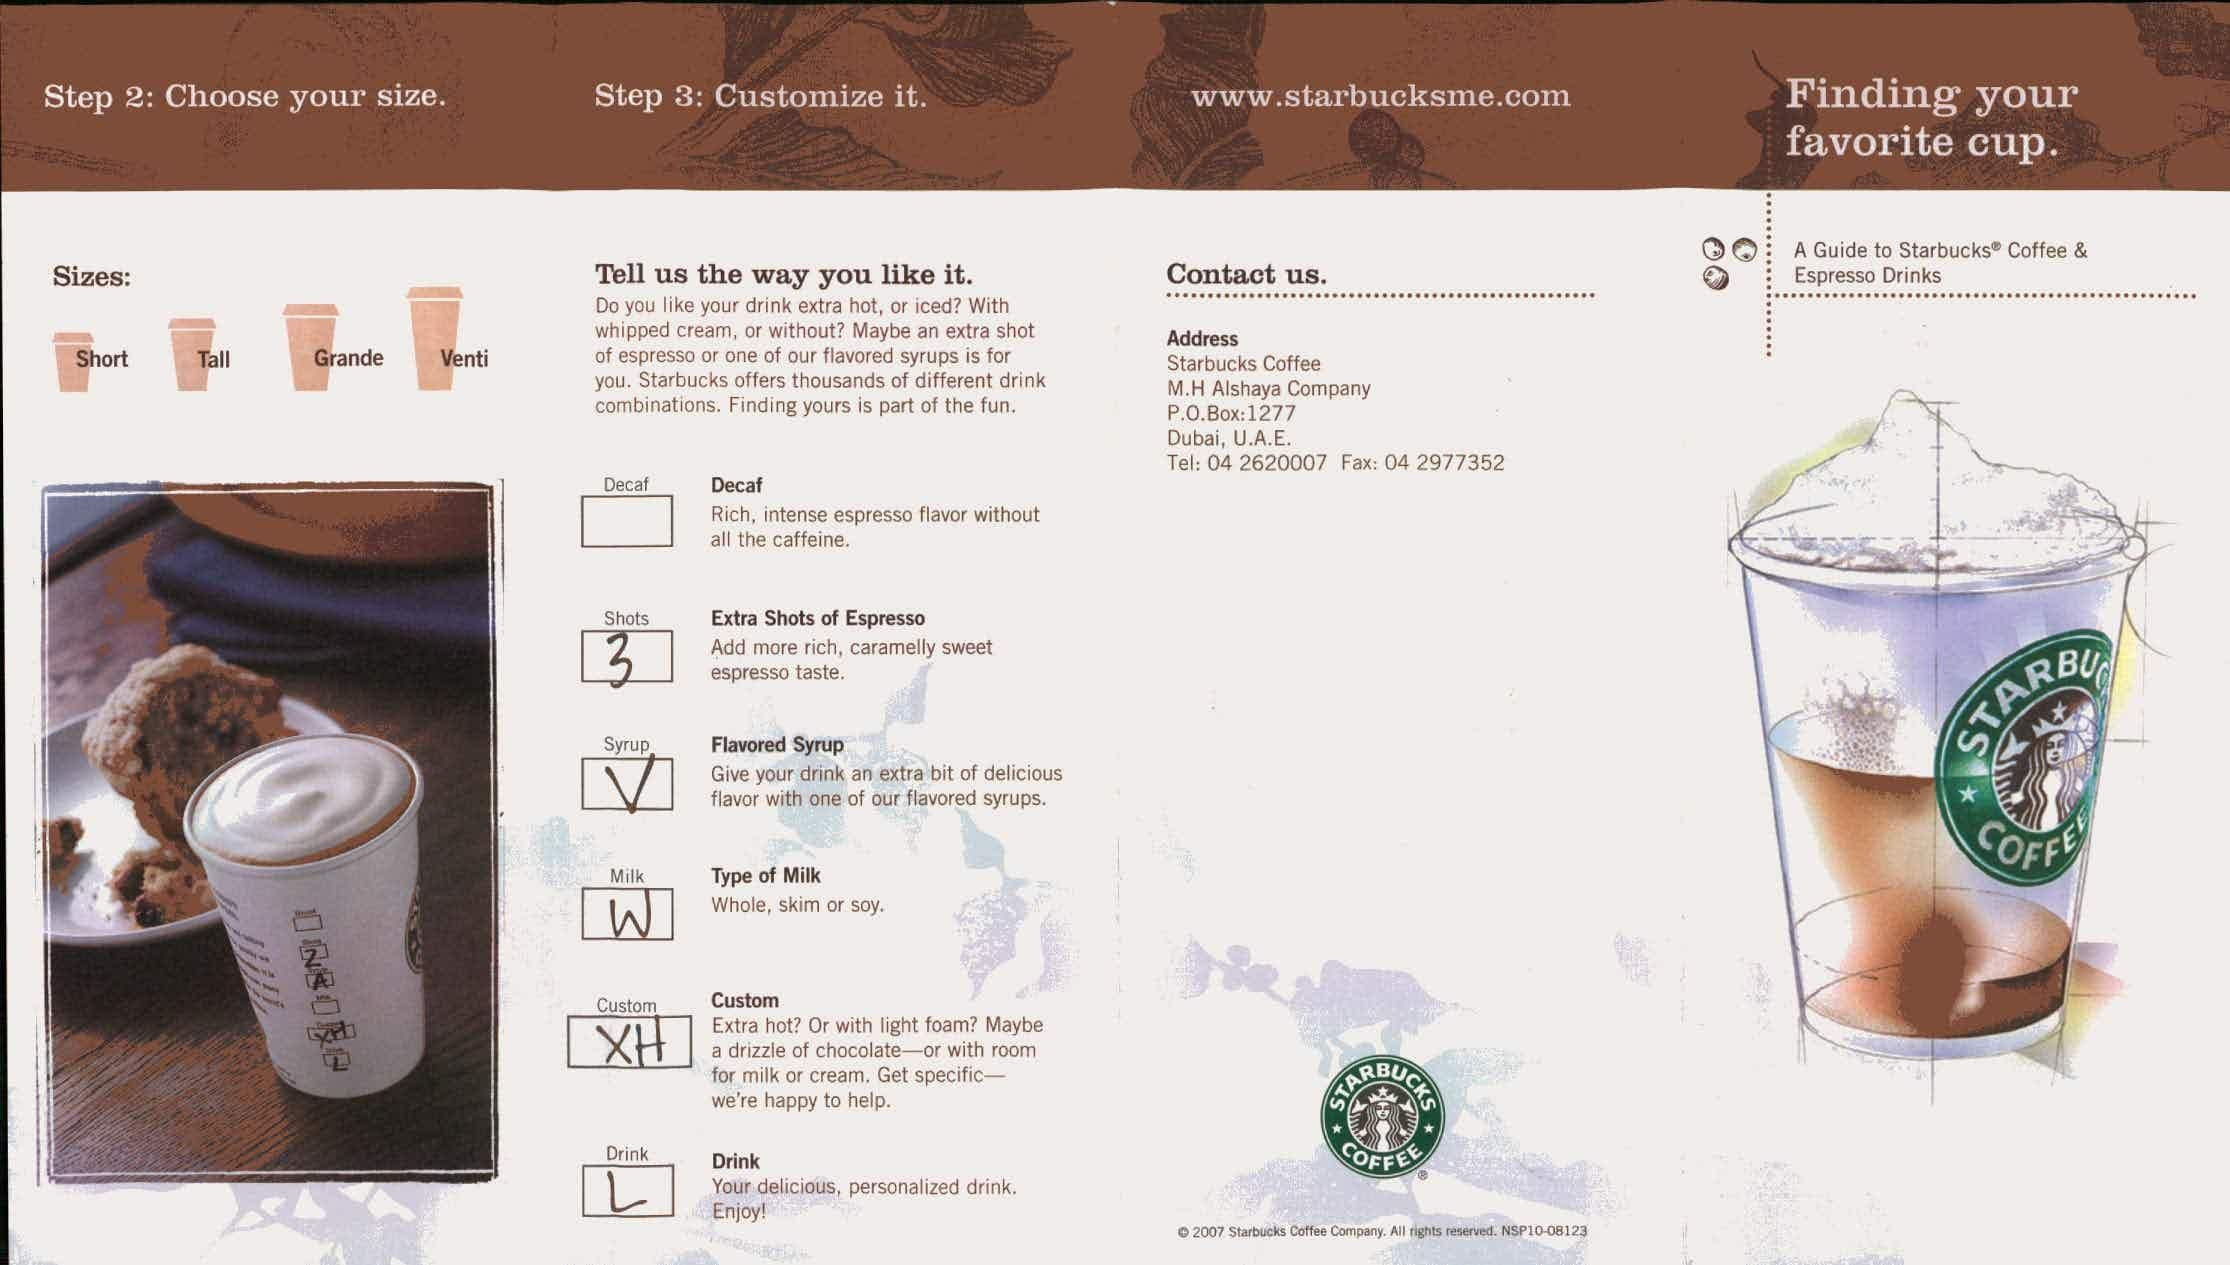 Starbucks Coffee Online Menu Starbucks Coffee Take Away Menu Starbucks Coffee Menu Card Dubai Uae Starbucks Coffee Aesthetic Coffee Coffee Humor